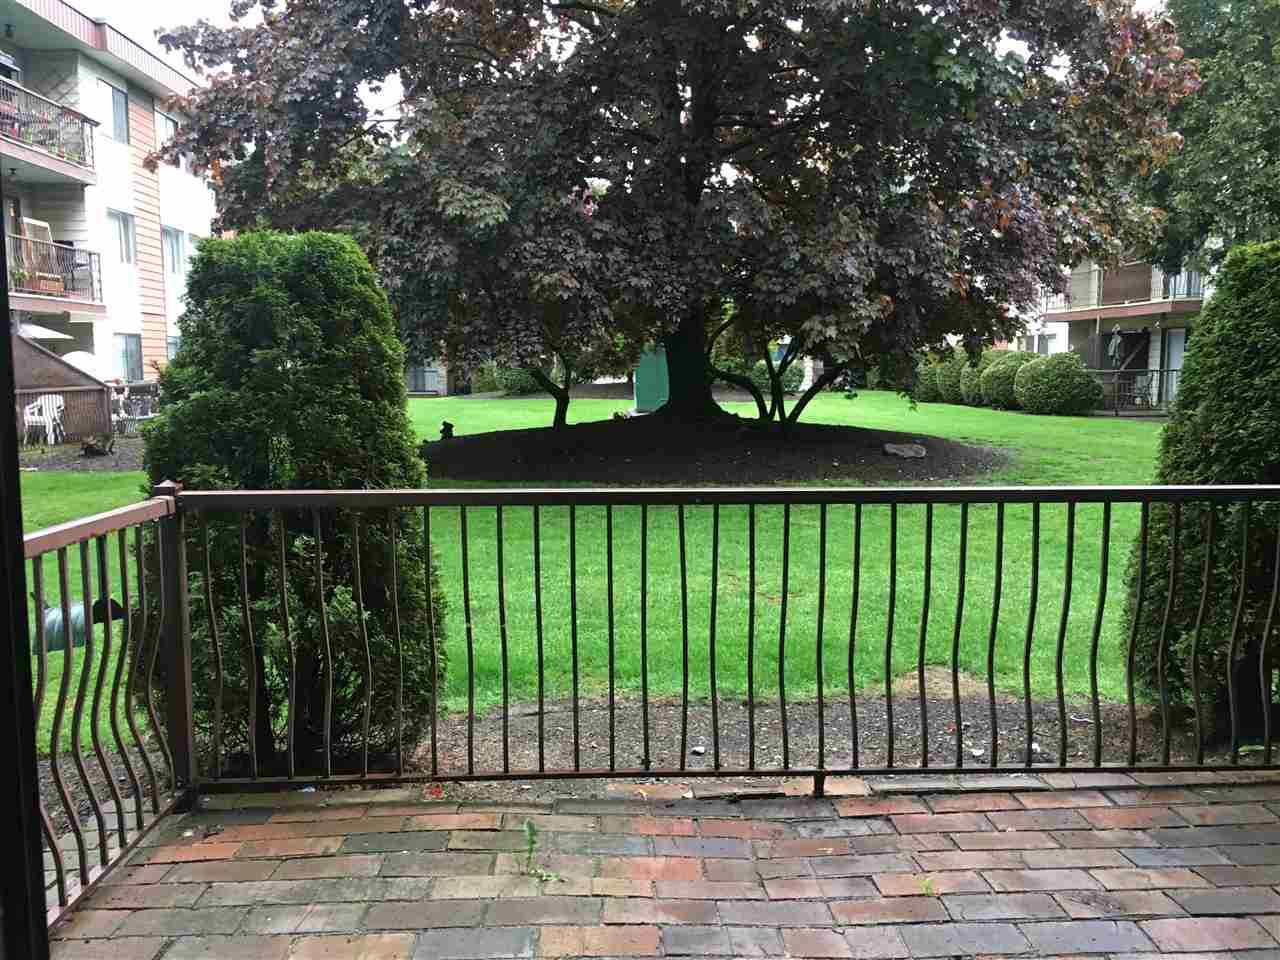 Main Photo: 205 1909 SALTON ROAD in Abbotsford: Central Abbotsford Condo for sale : MLS®# R2168048